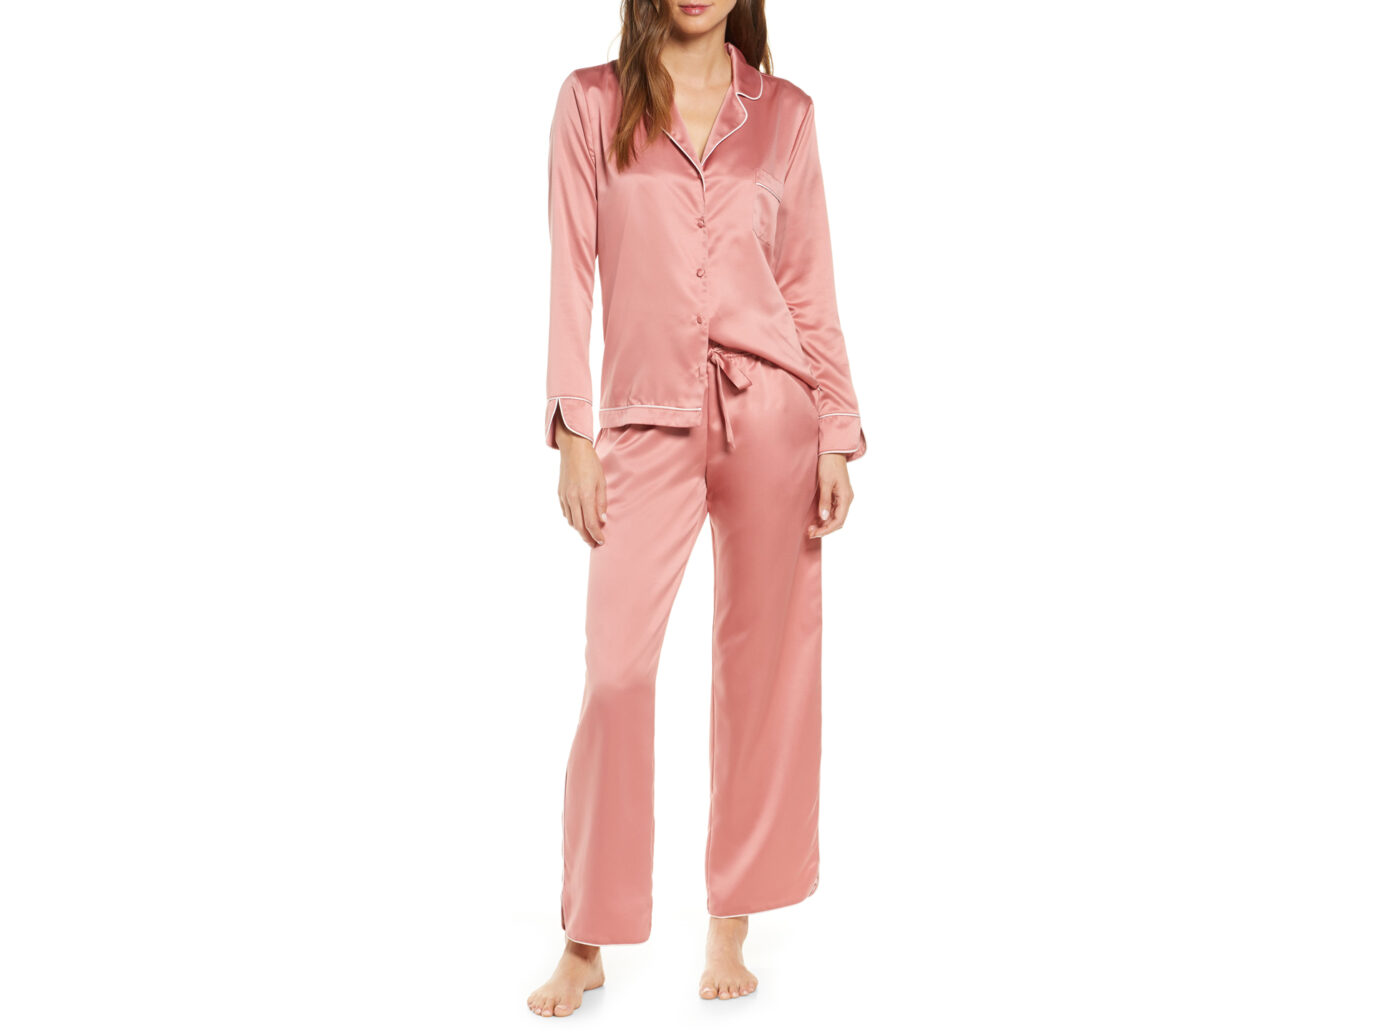 Rachel Parcell Satin Pajamas